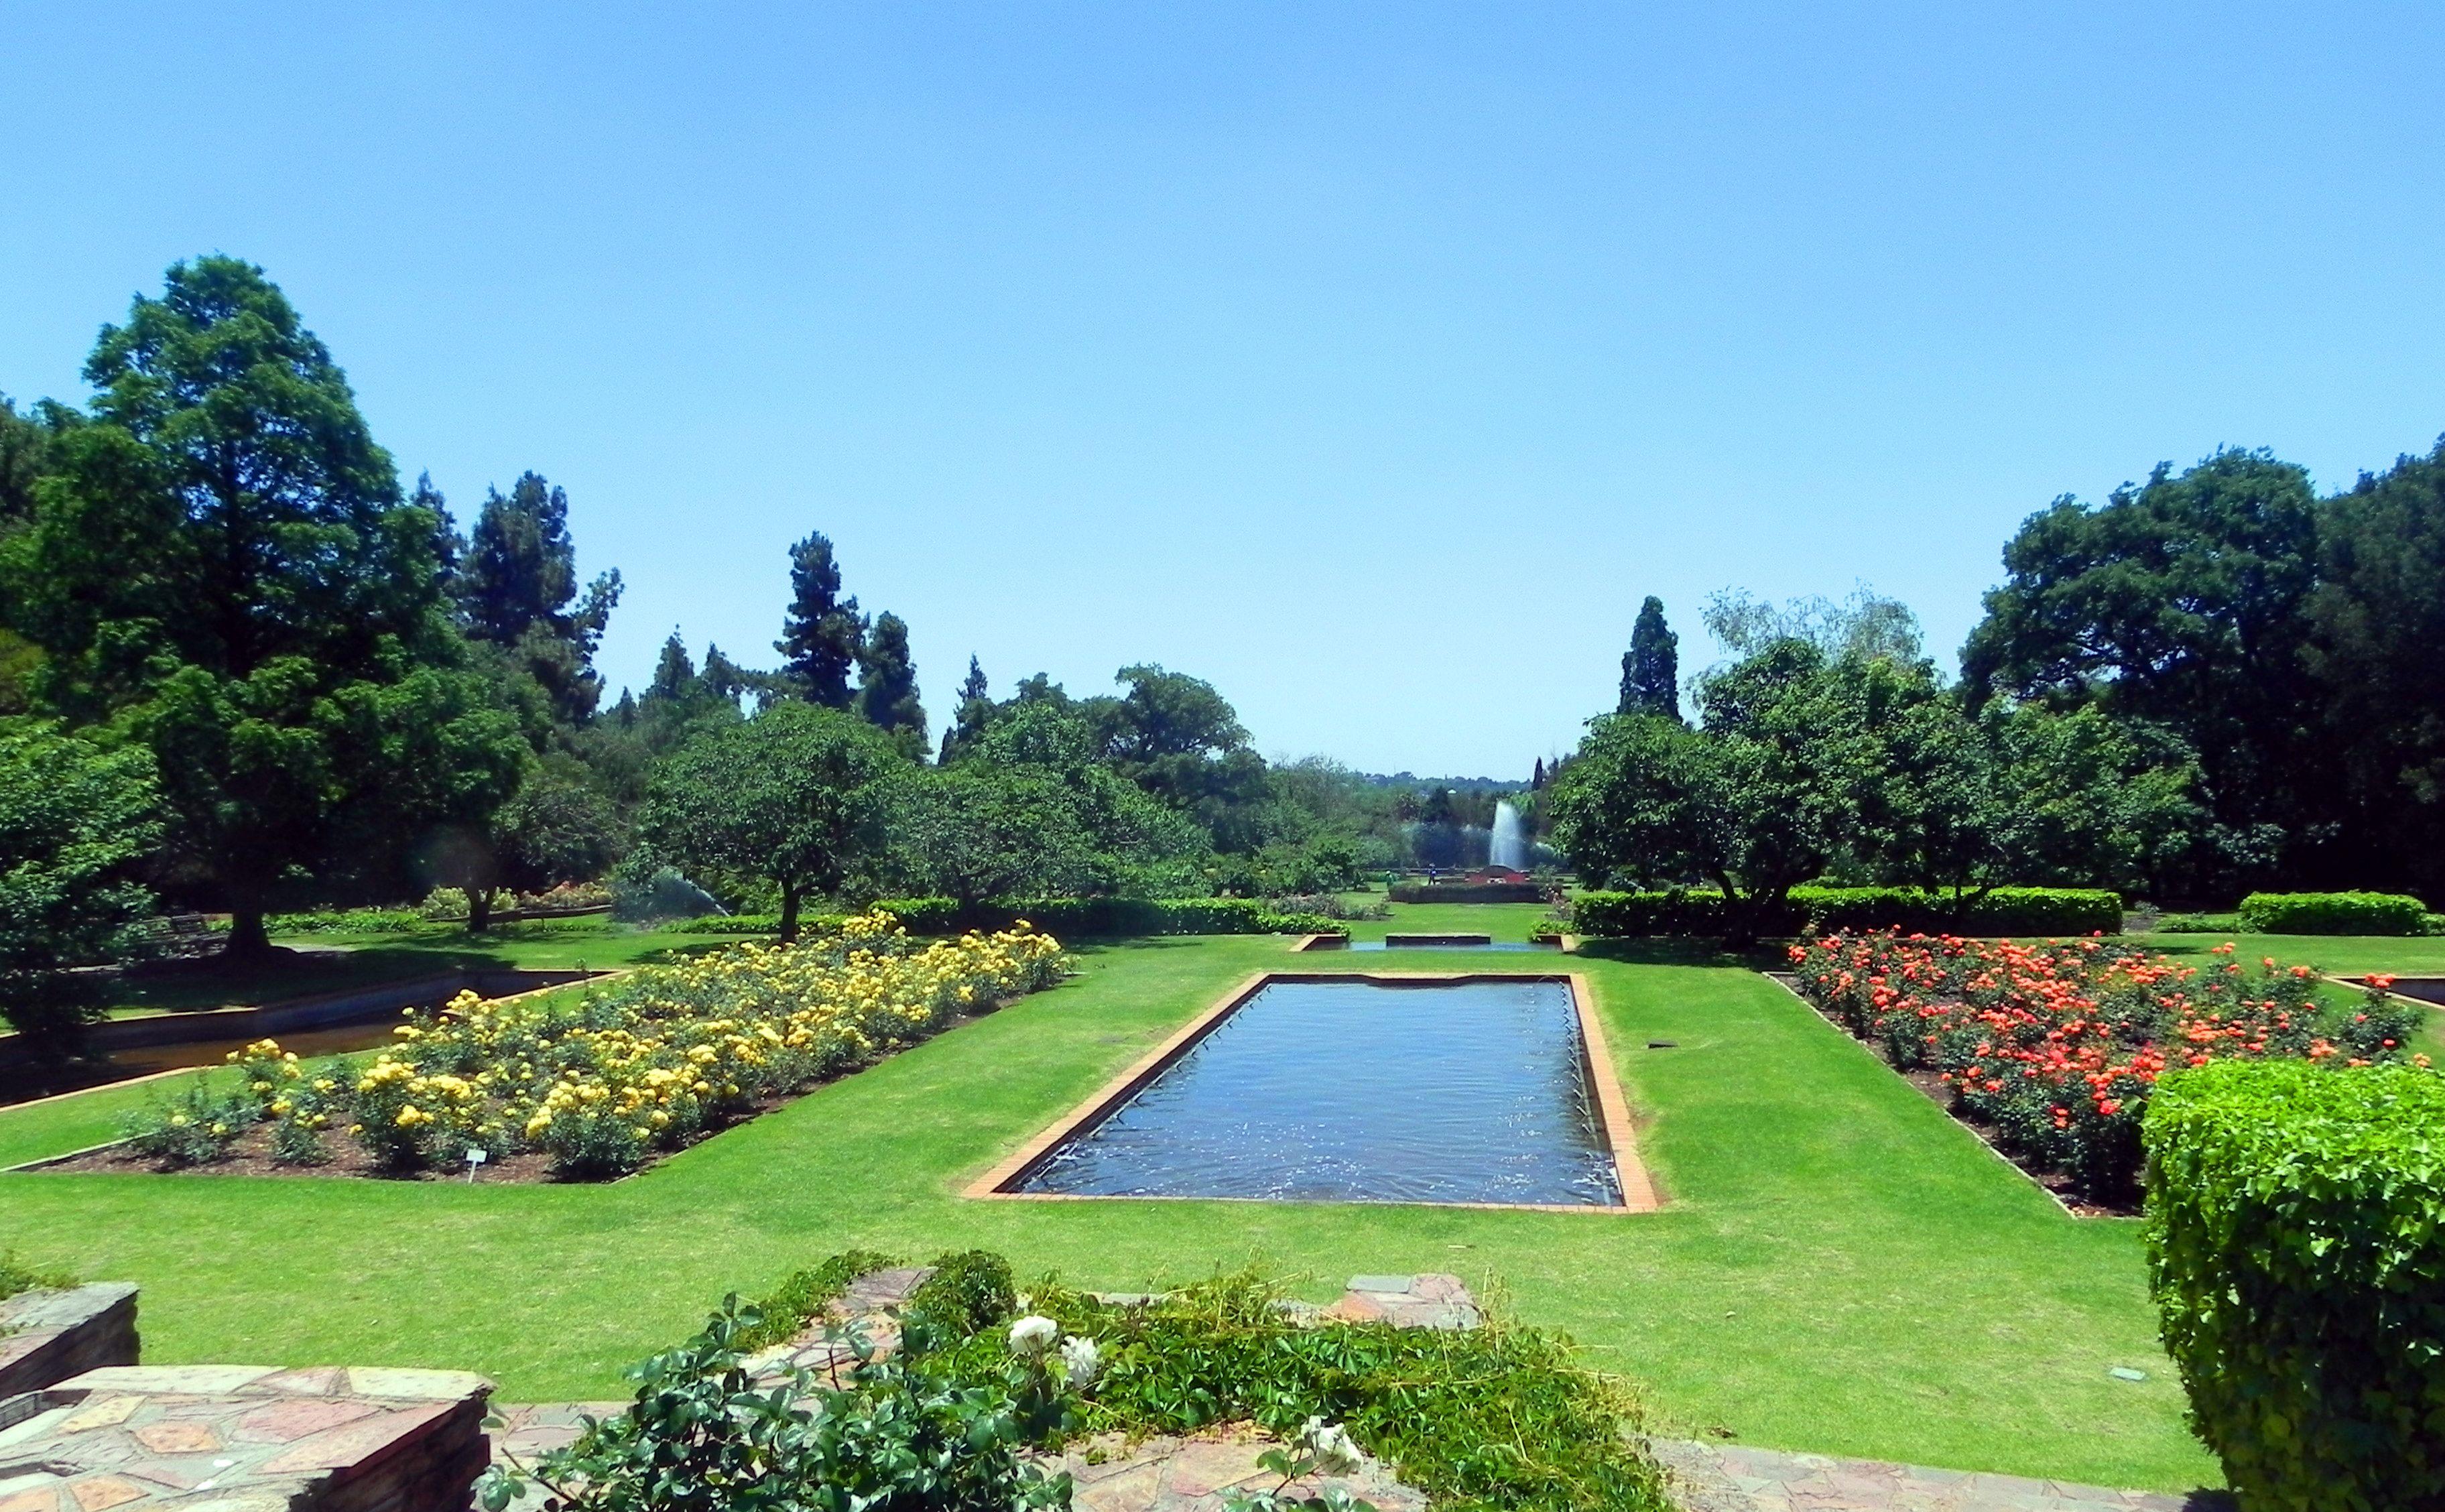 322ac57178d9c8d2b5497eb0b0159658 - Walter Sisulu Botanical Gardens Wedding Prices